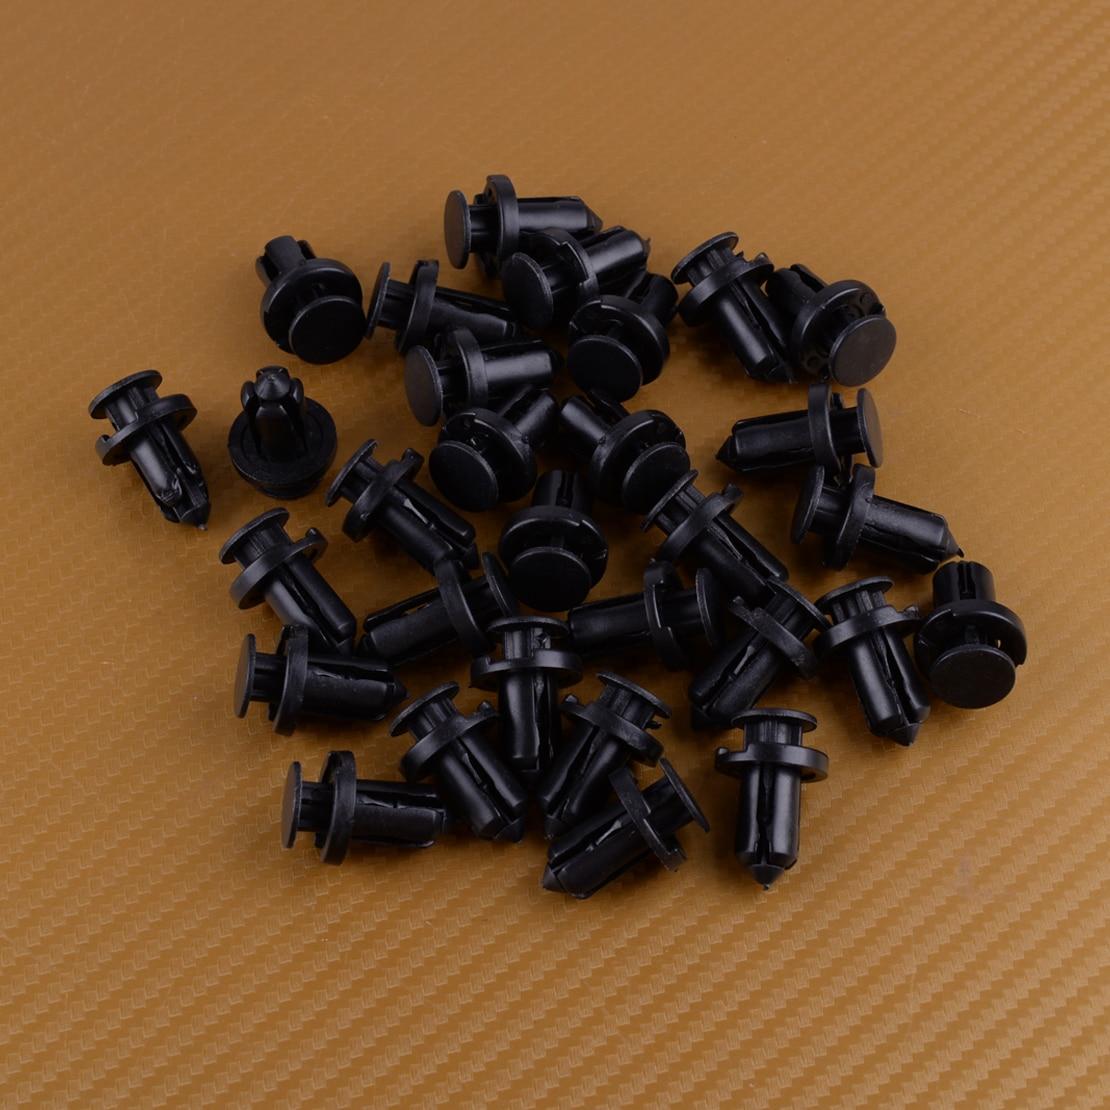 beler Black Nylon Car Accessories 30Pcs Push Type Bumper Fastener Retainer Clips Rivet Fit For Nissan 01553 09241 0155309241|Auto Fastener & Clip|   - AliExpress